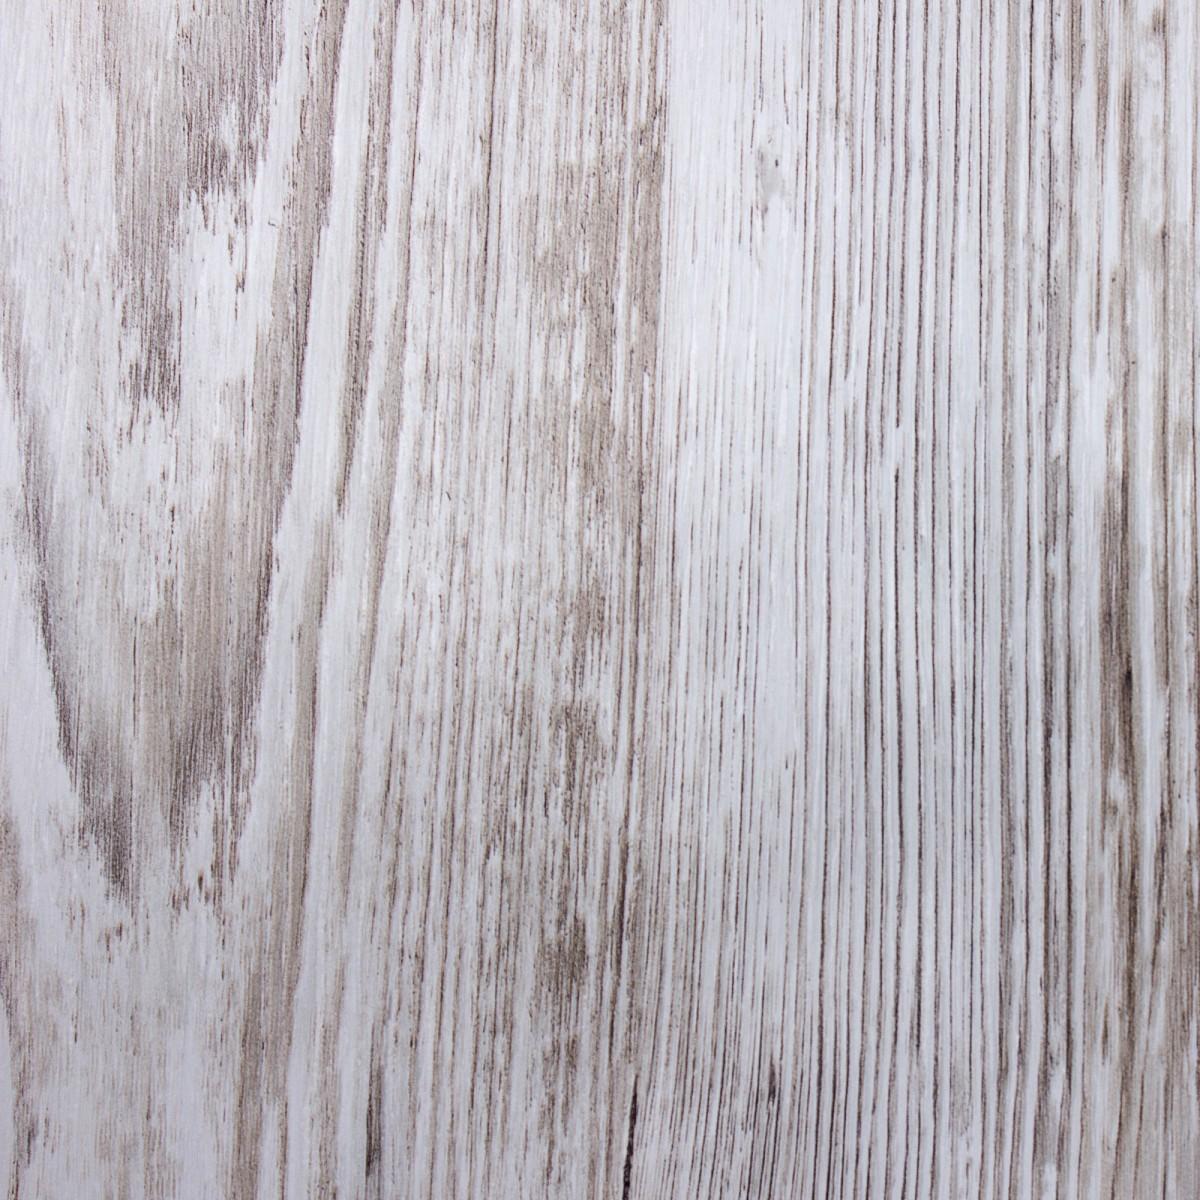 Дверь Межкомнатная Глухая Рустик 80x200 Цвет Северная Сосна